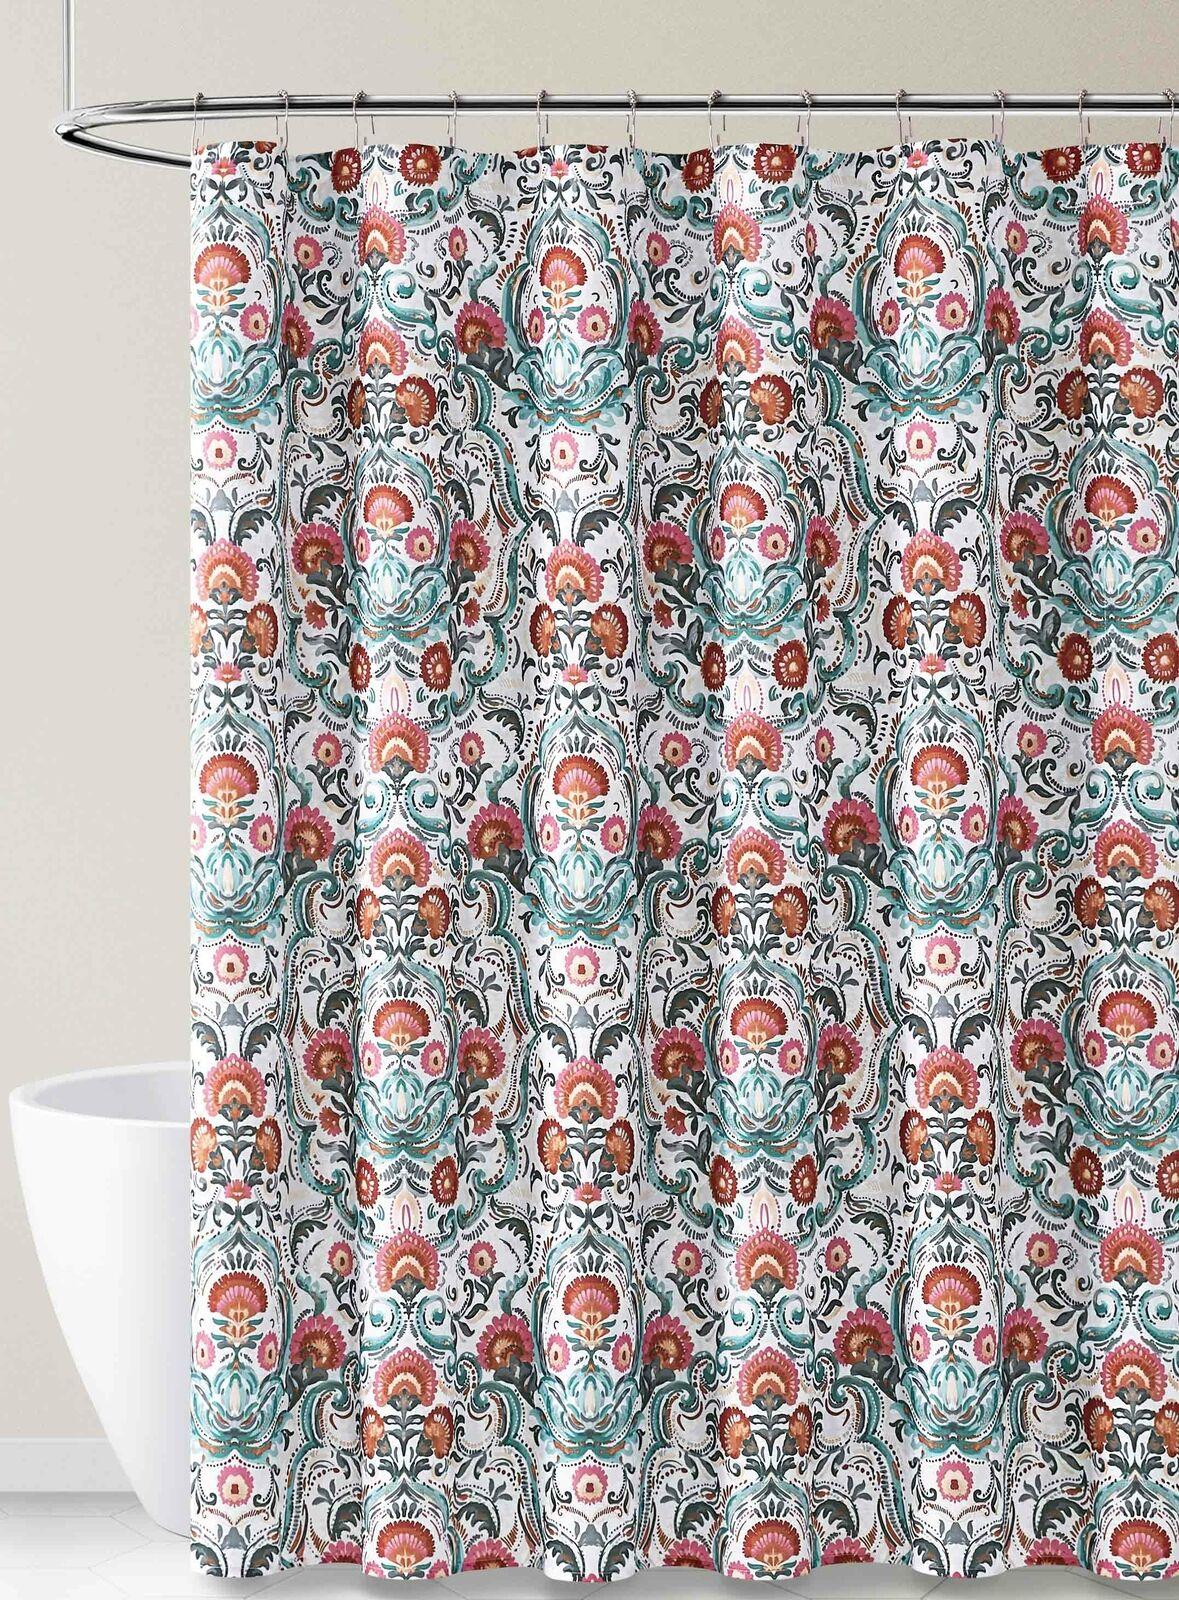 Marimekko Shower Curtain Iso Satakieli Design By Maija Louekari White Multi For Sale Online Ebay